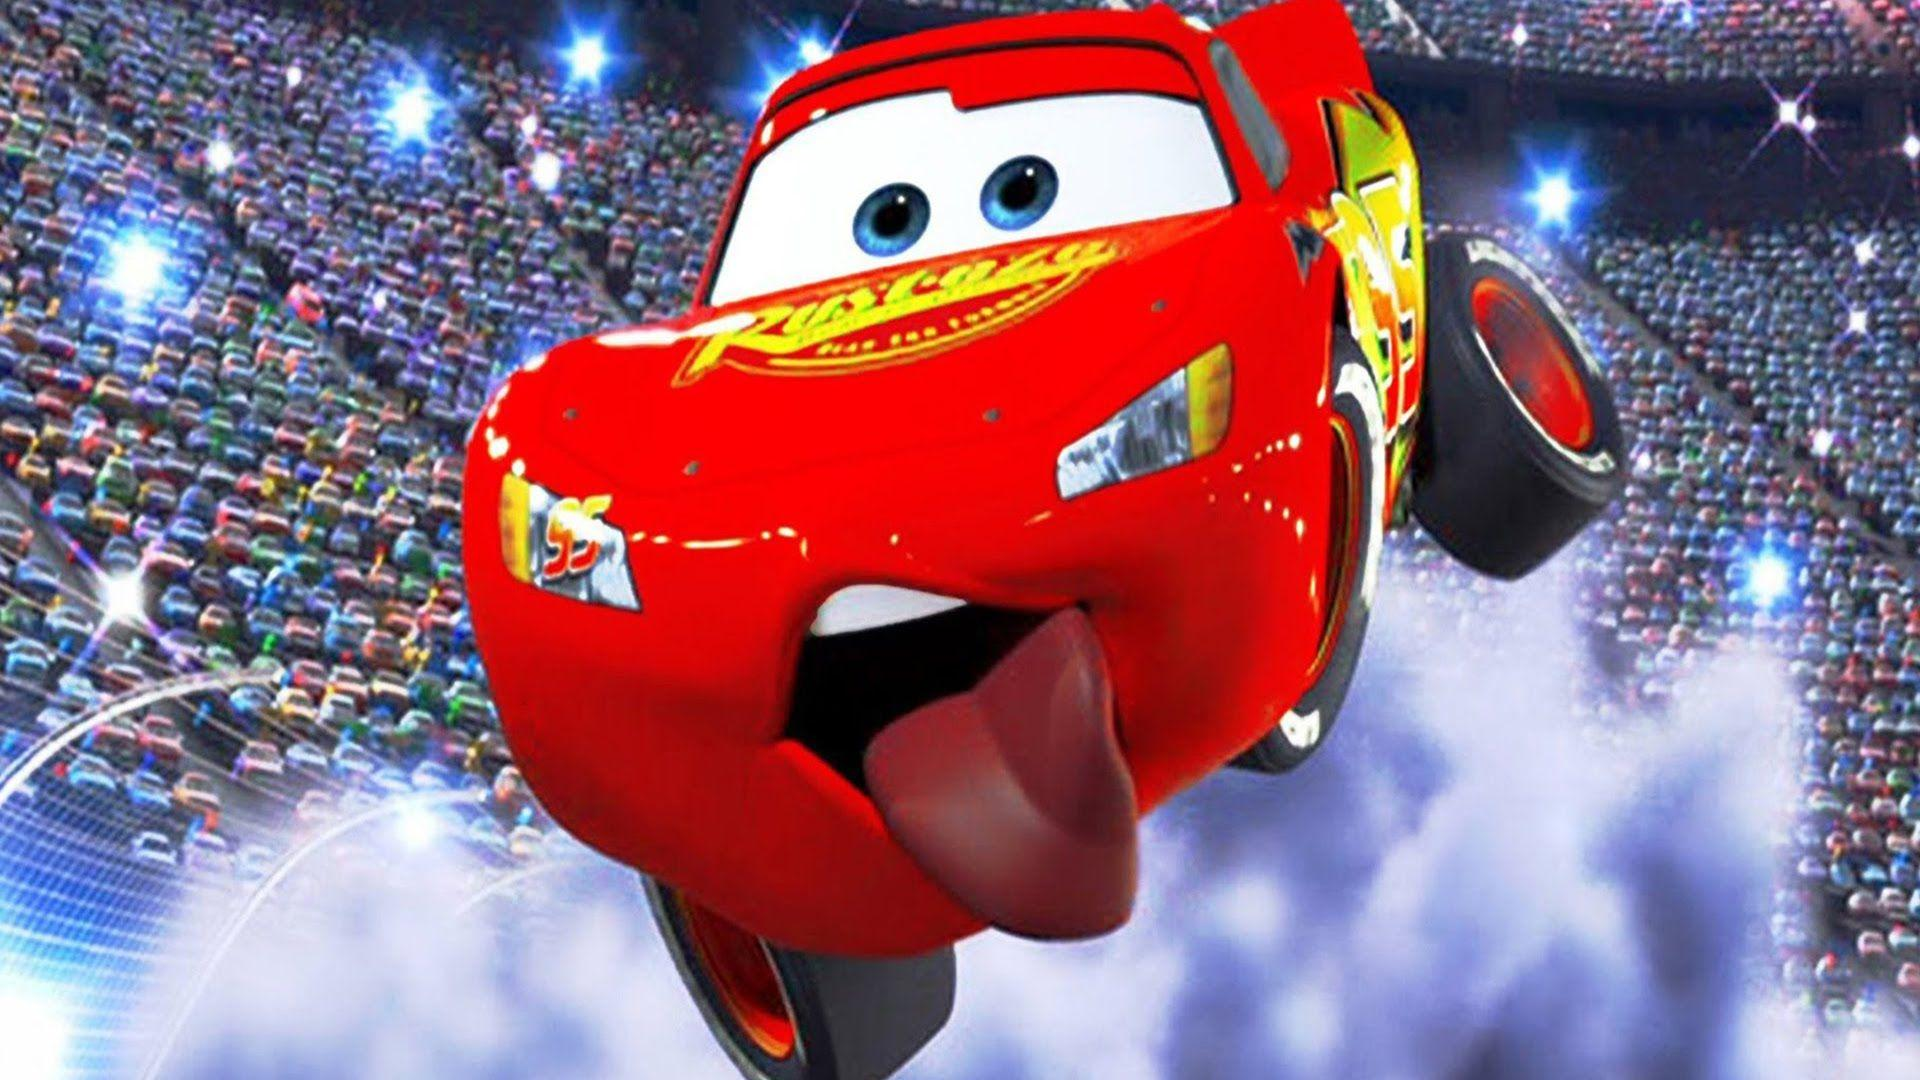 Disney Pixar Cars Wallpapers HD - Wallpaper Cave